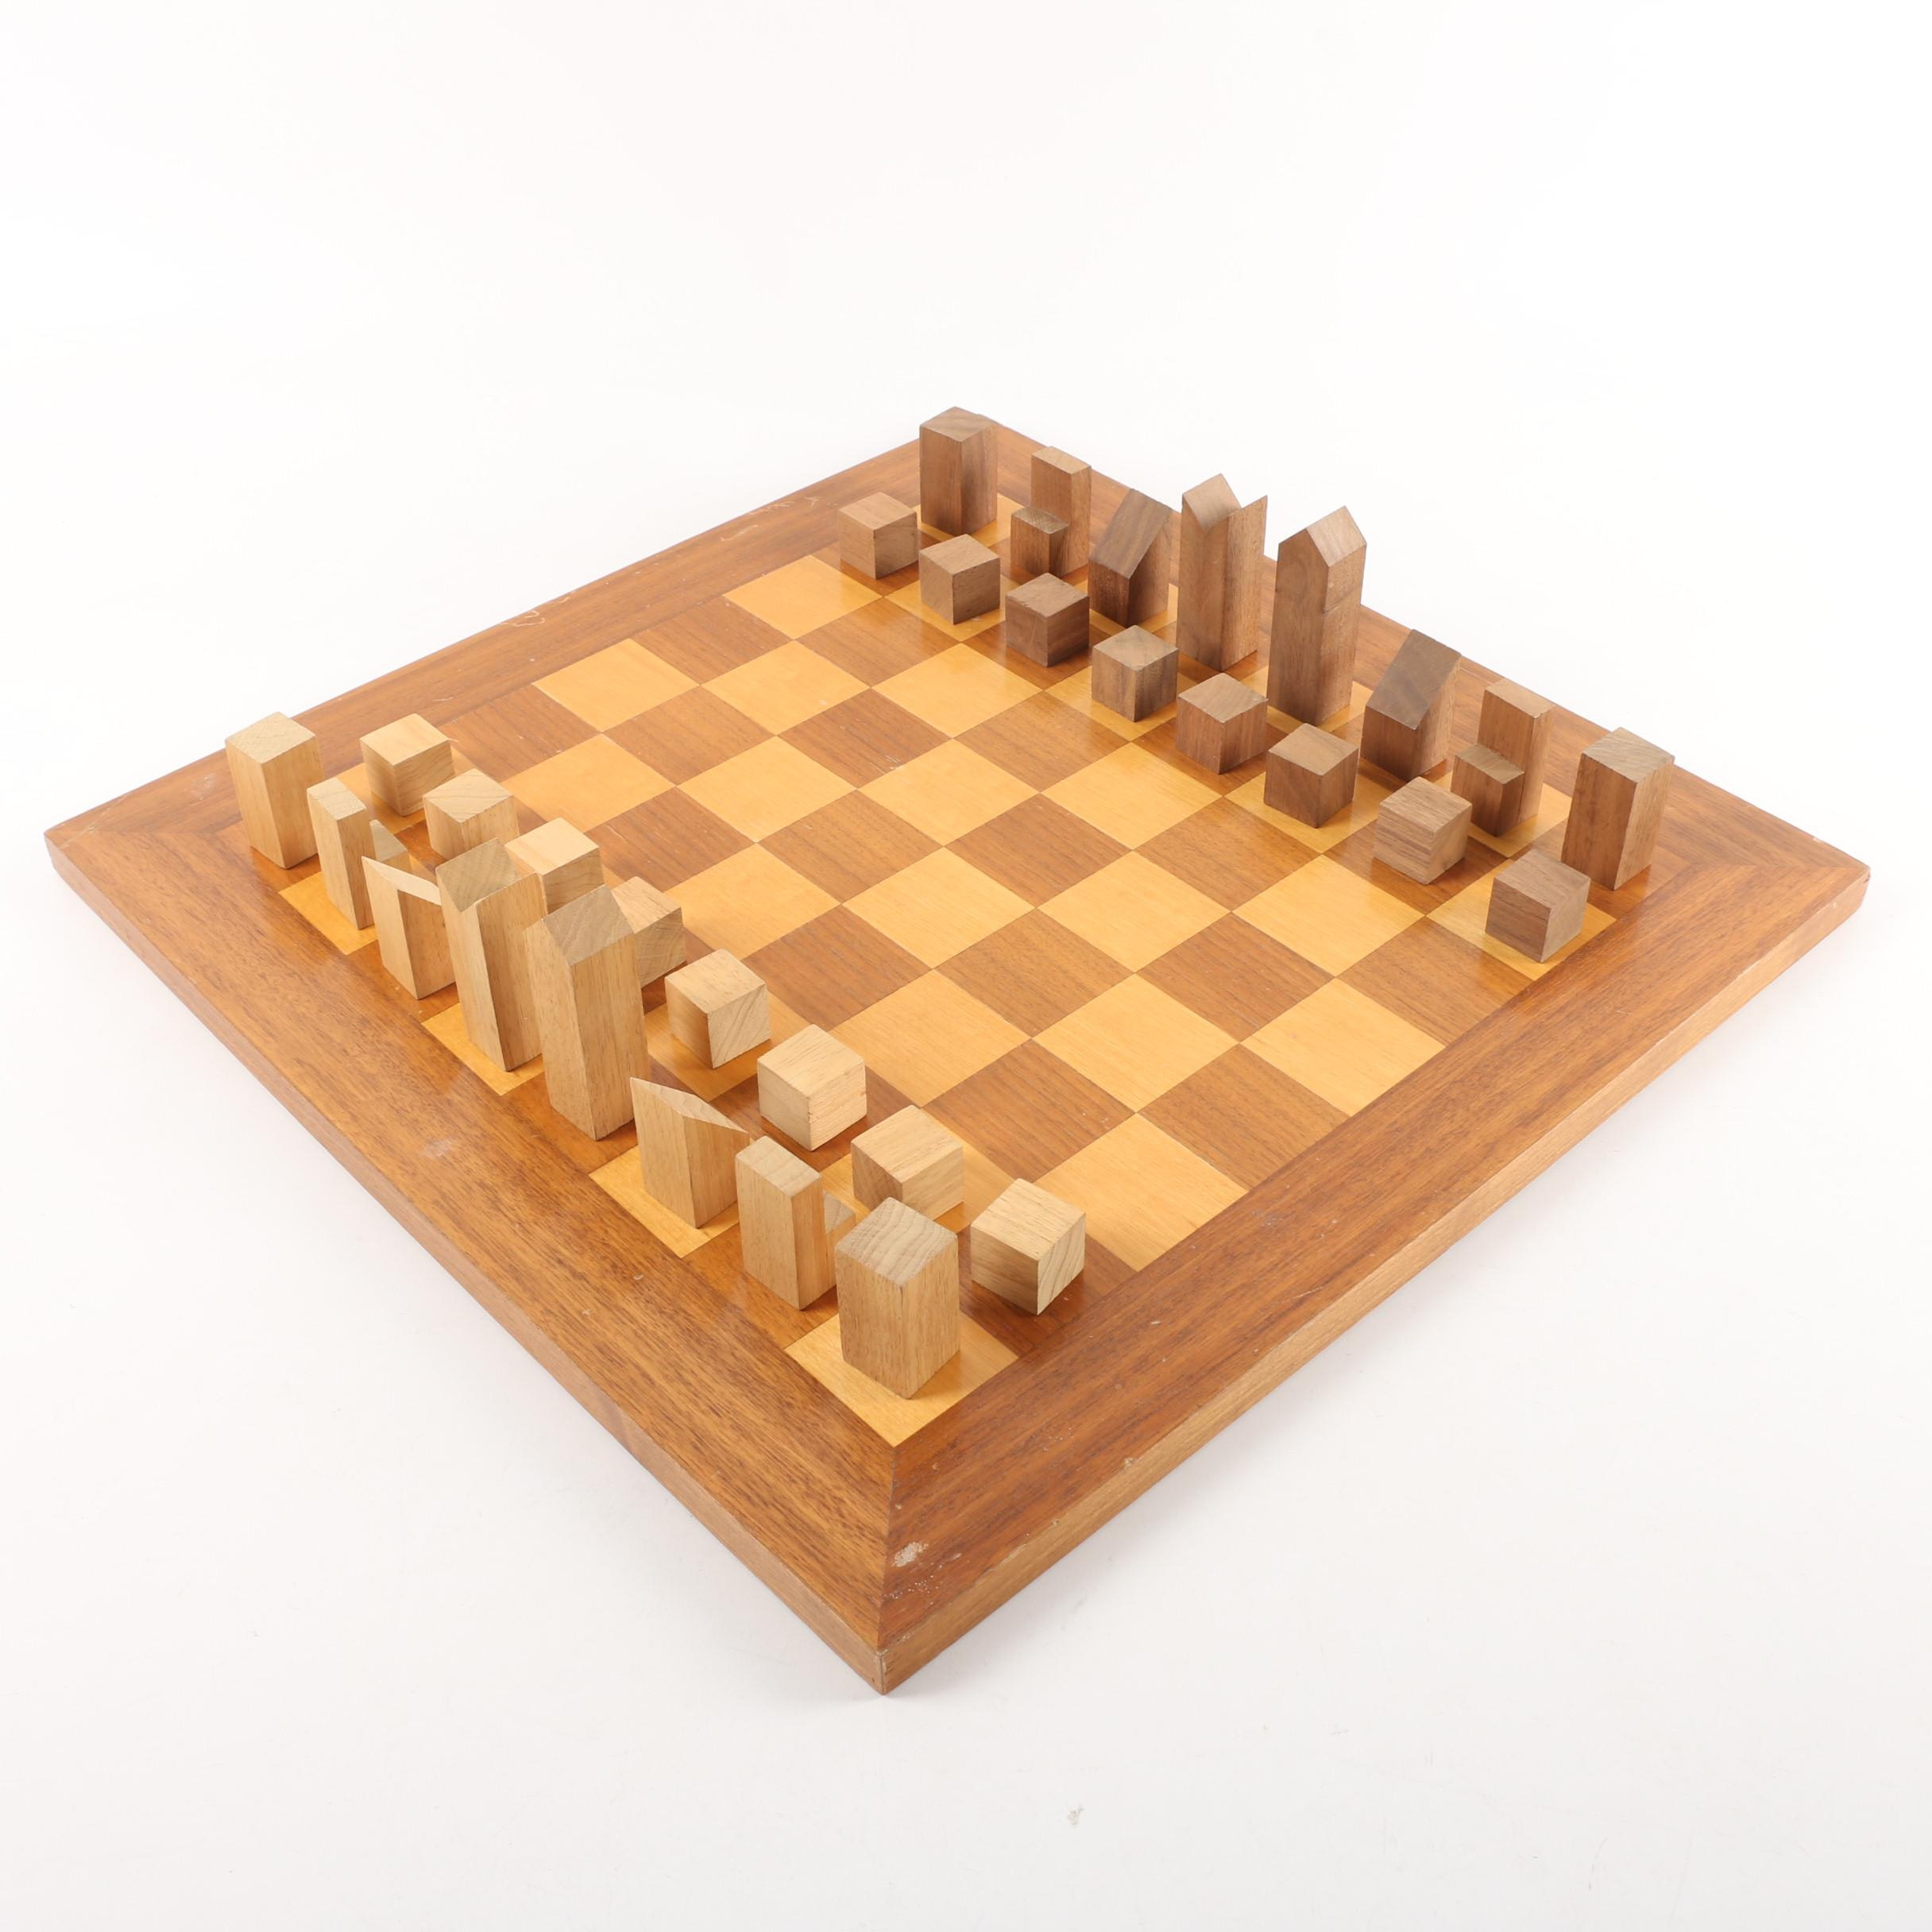 Berea College Woodcraft Handmade Chess Set